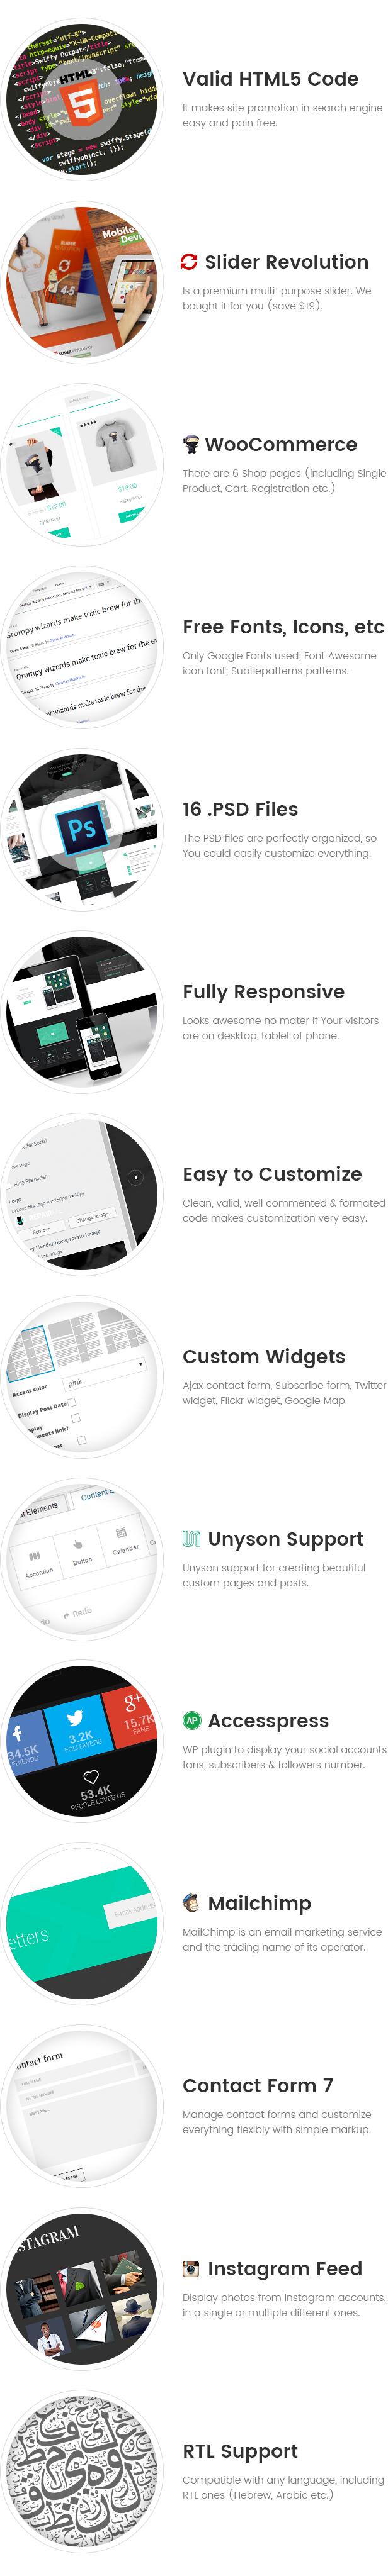 repairme_wp_features